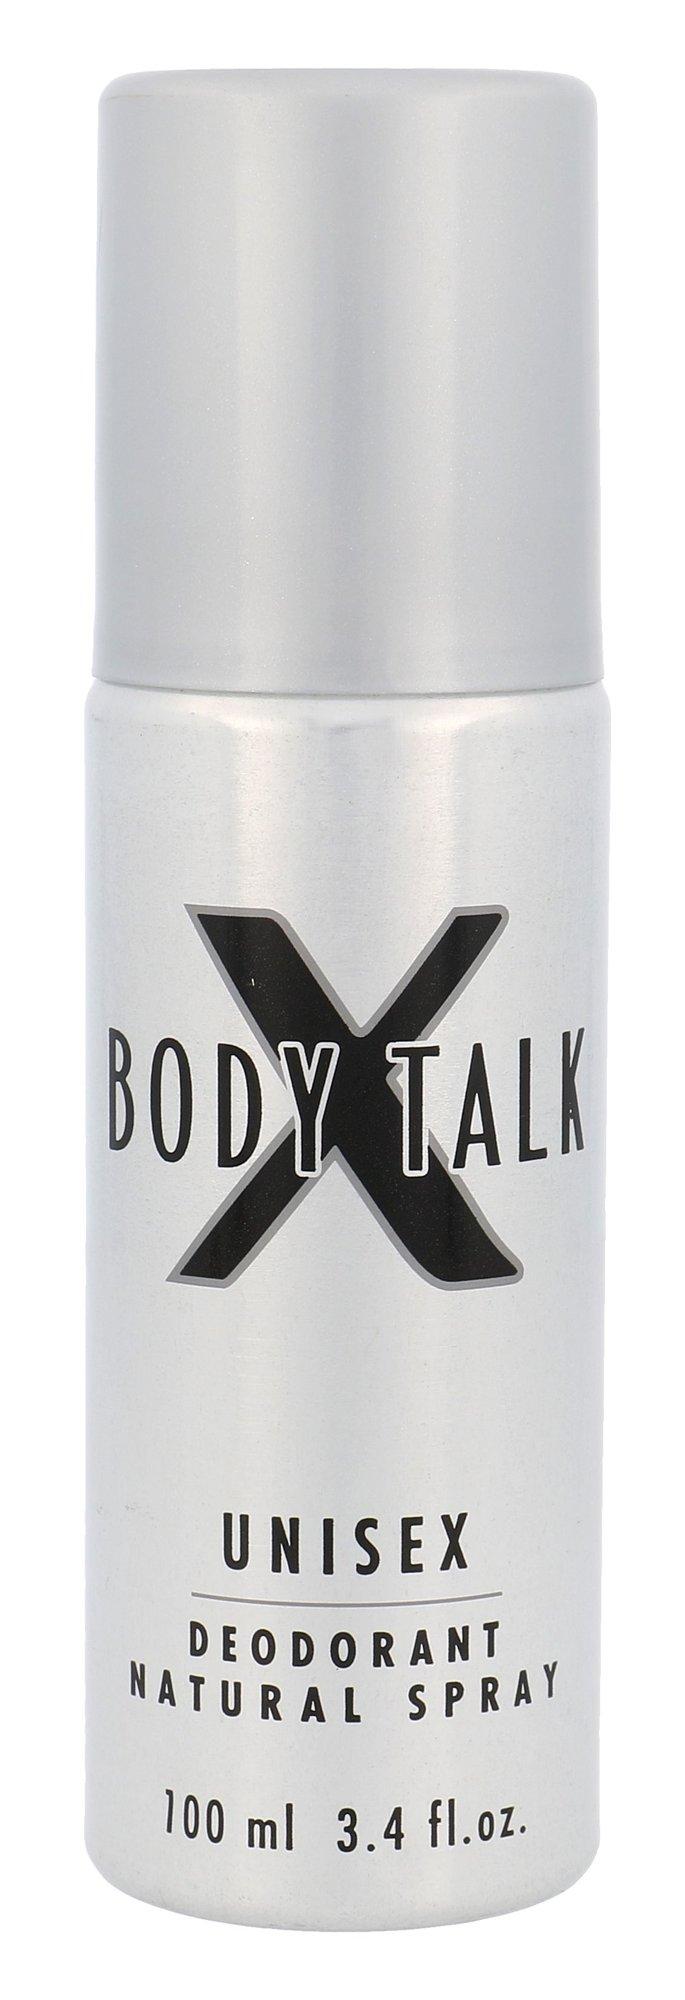 Muelhens X Body Talk Deodorant 100ml